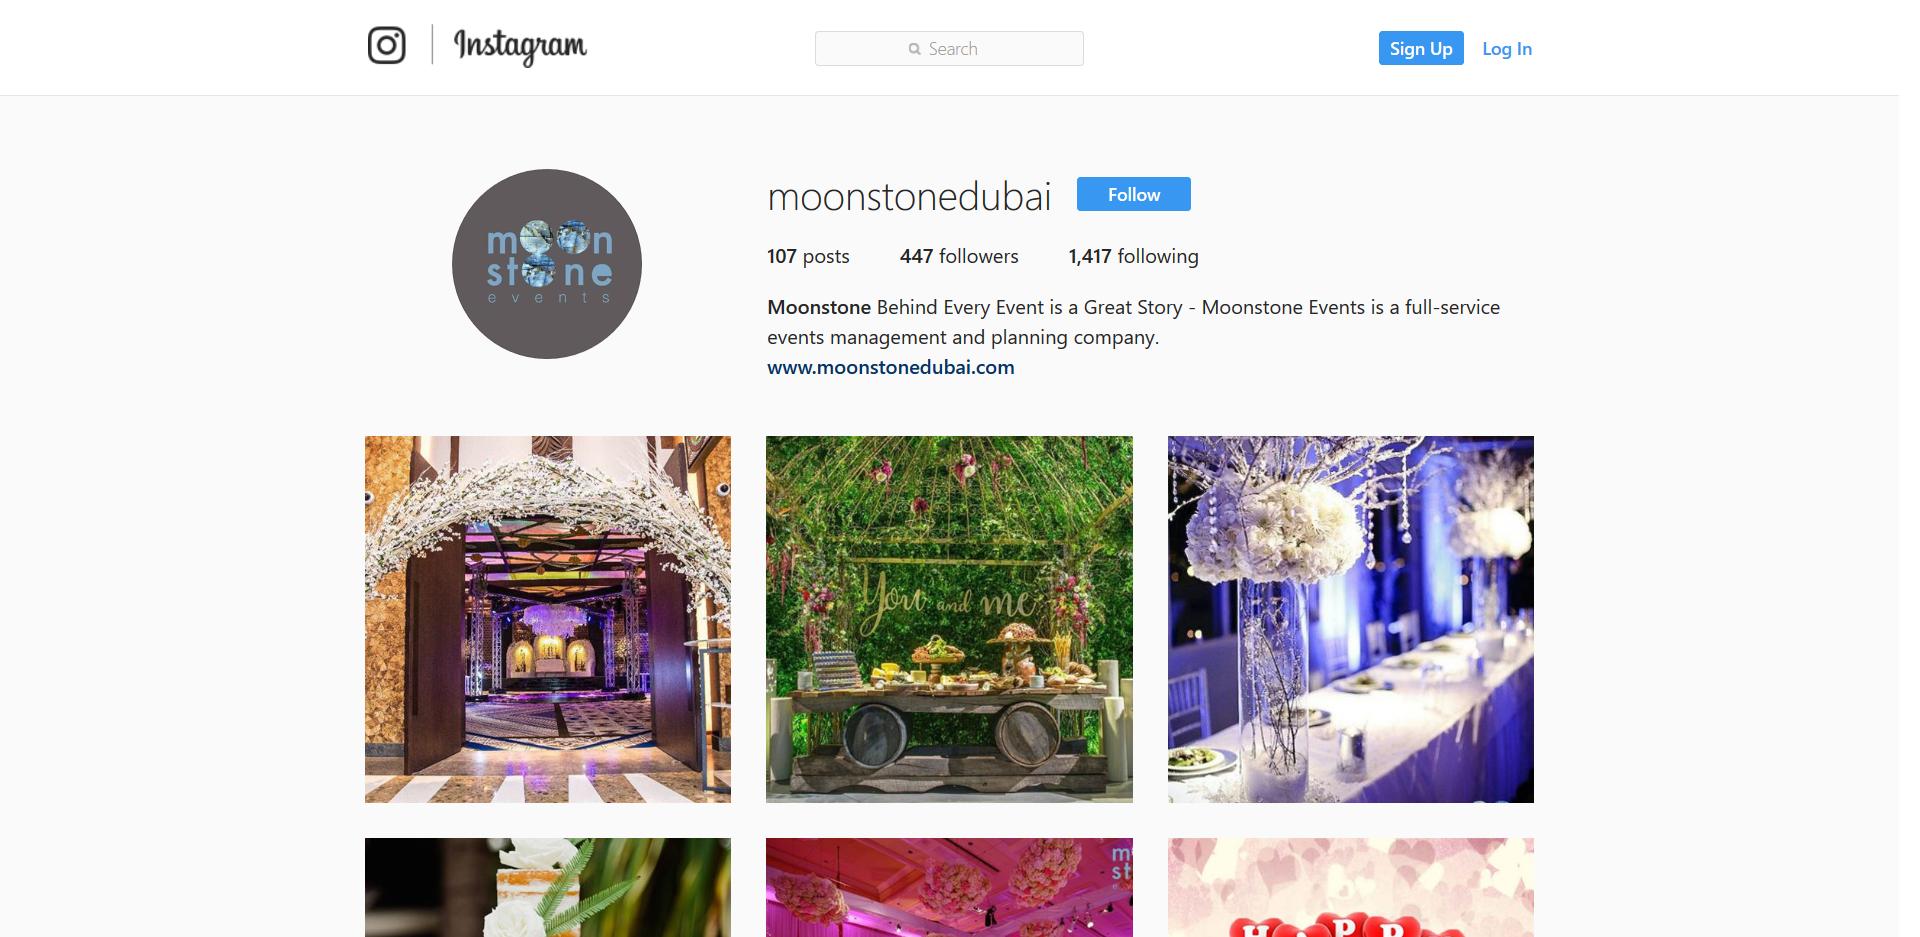 MOONSTONE DUBAI - AZ Media LLC